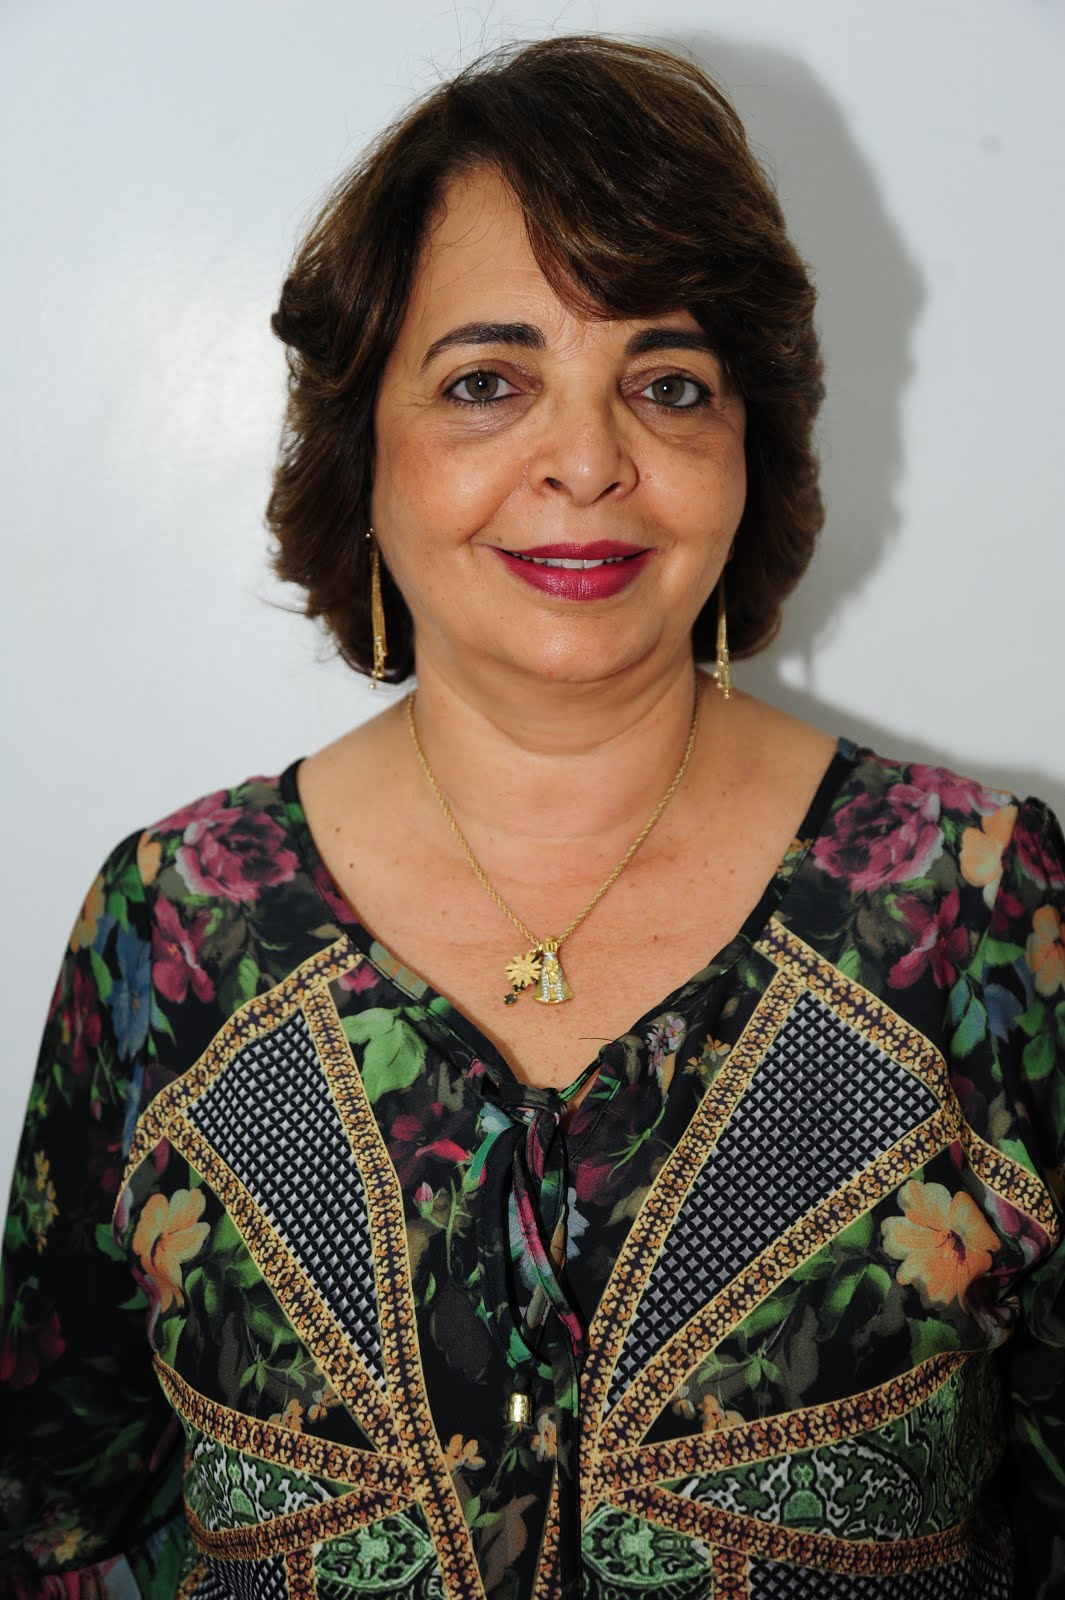 Coordenadora Regional - REDE -  PEA/UNESCO - MG - Amália Kátia Ferreira Mendes